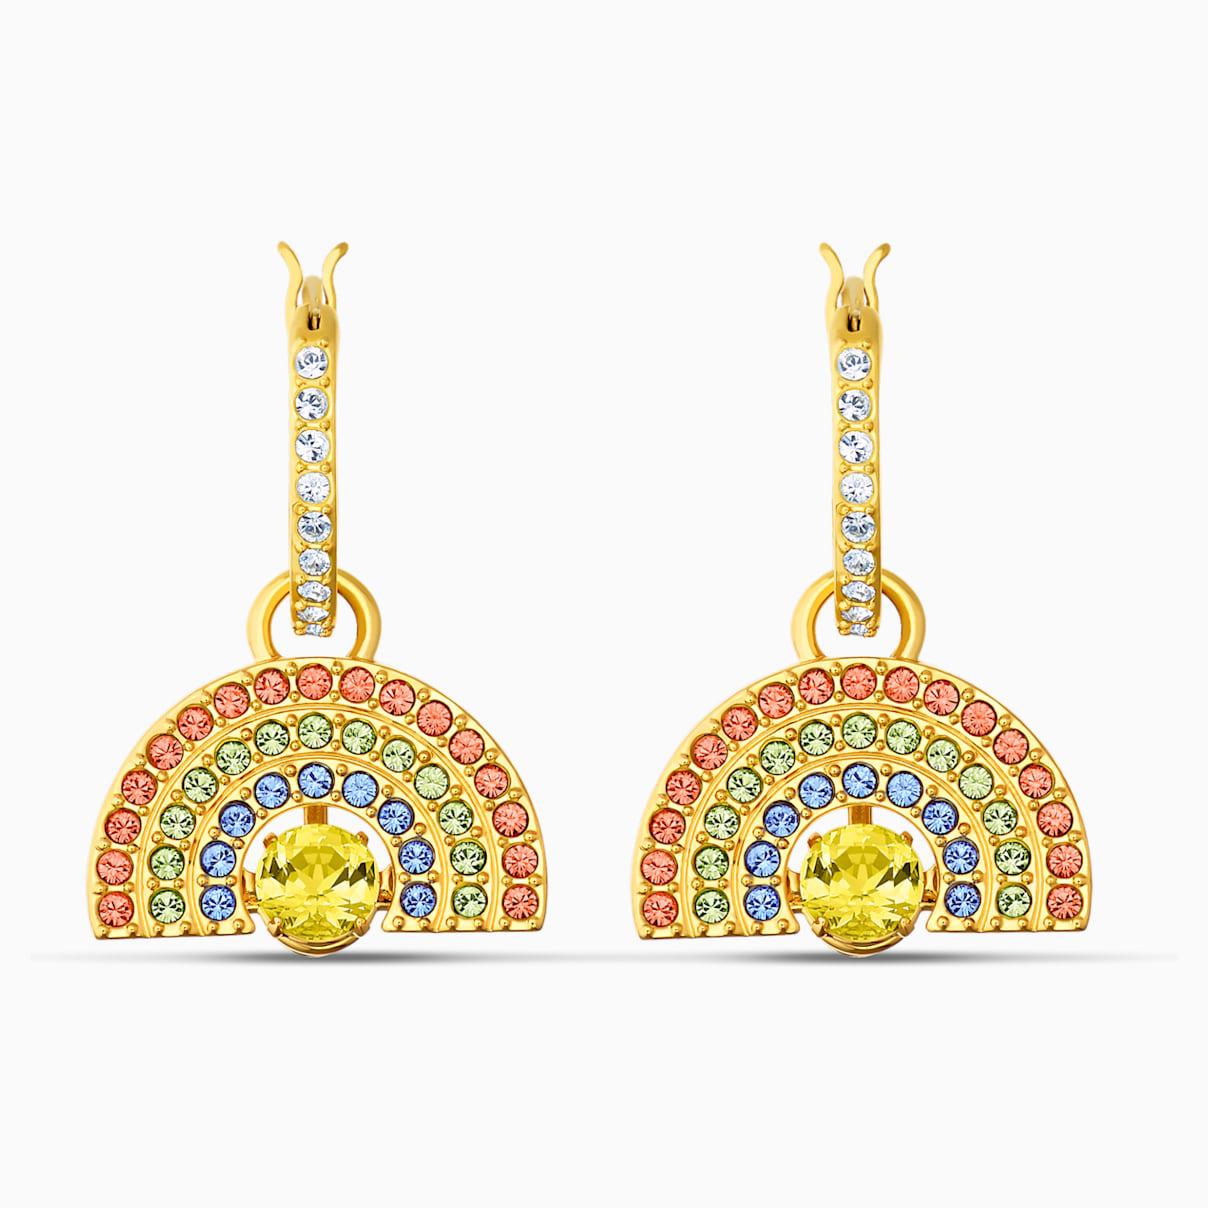 Swarovski Sparkling Dance Rainbow Pierced Earrings, Light multi-colored, Gold-tone plated